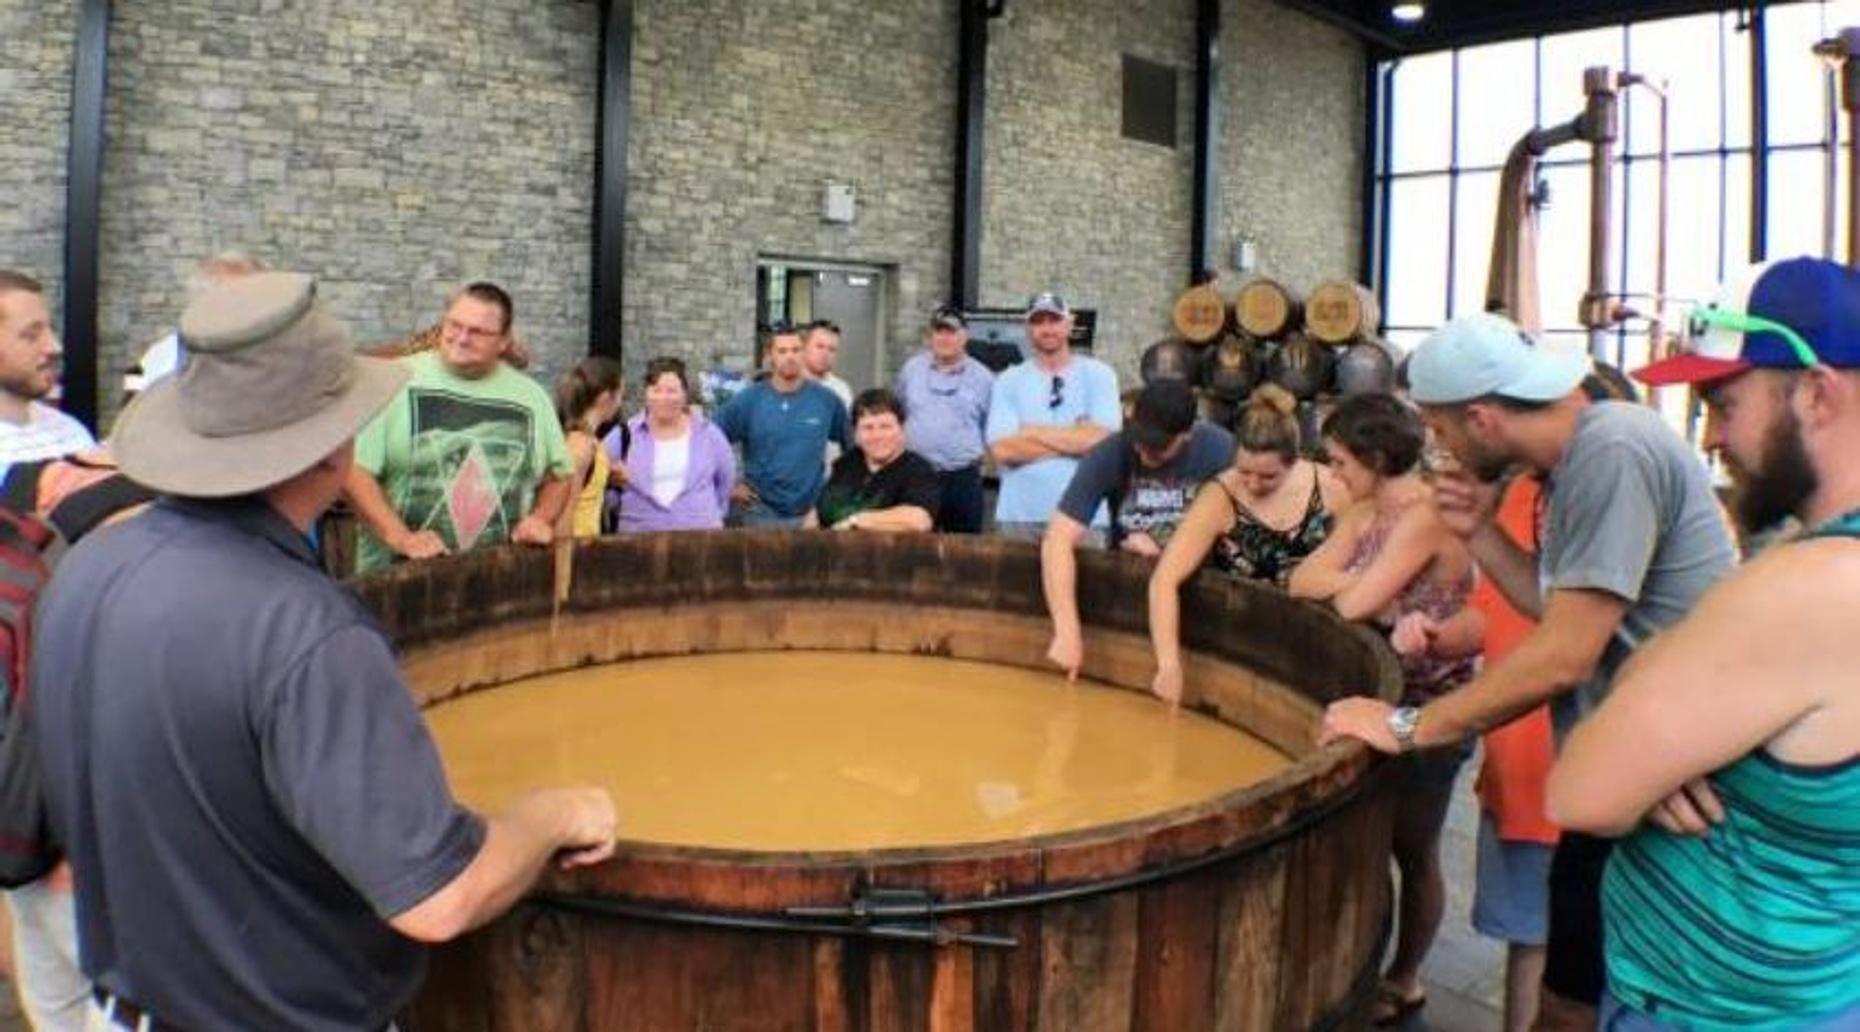 Twilight Brewery Tour in Lexington